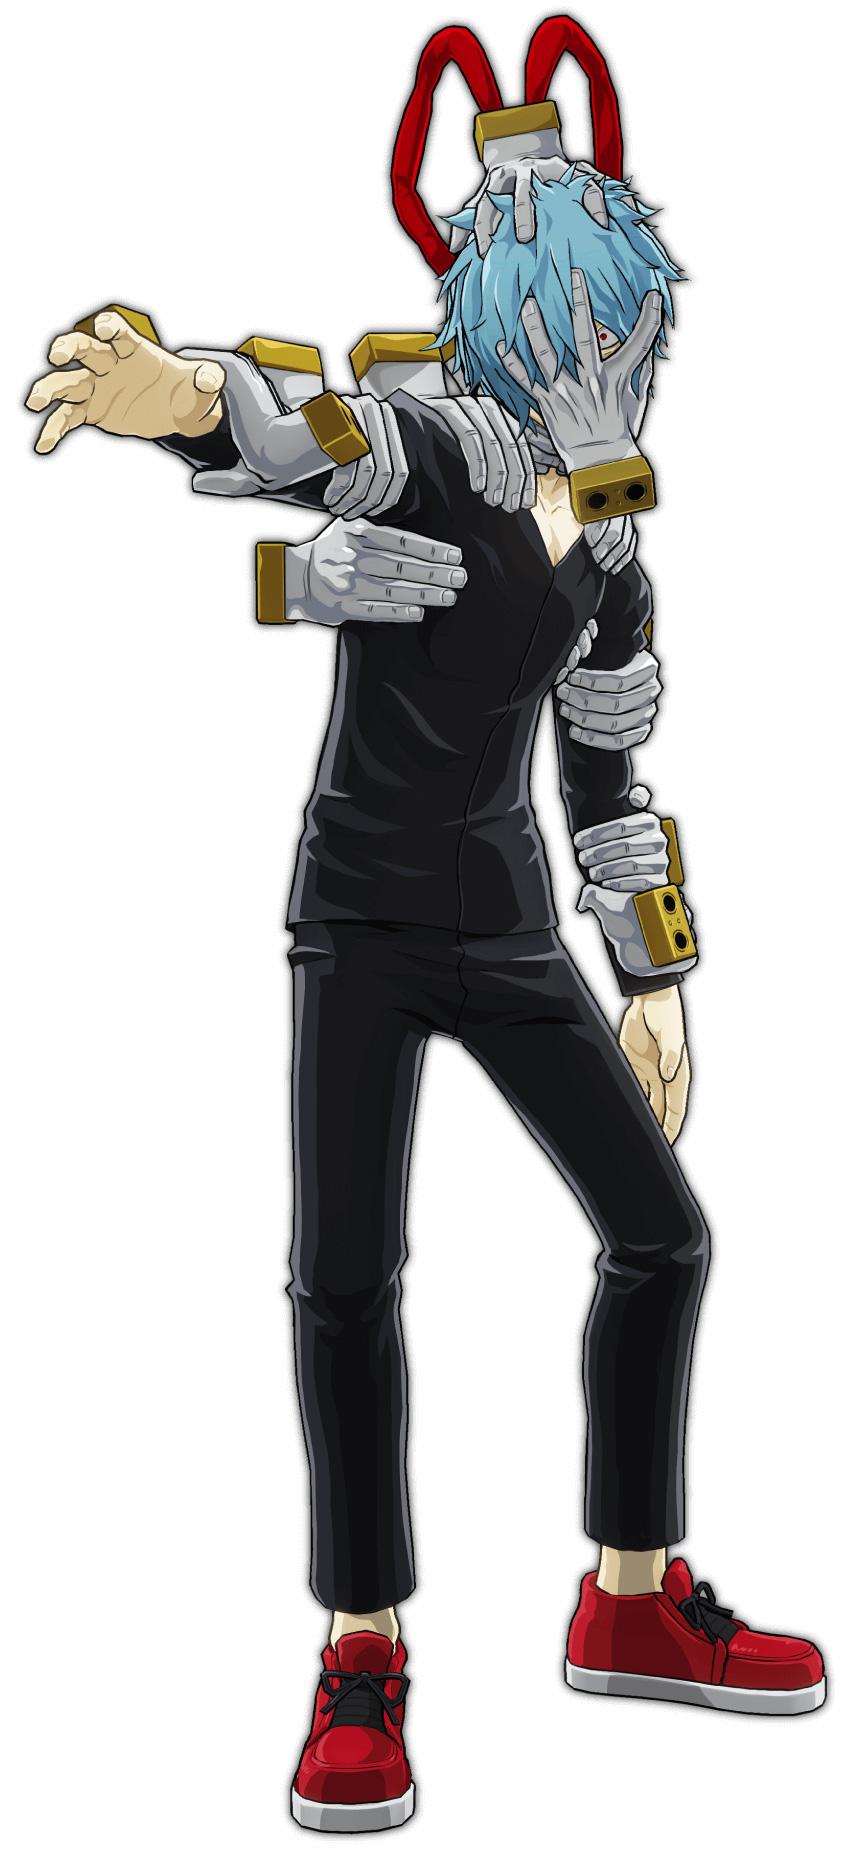 Boku-no-Hero-Academia-Ones-Justice-Character-Render-Tomura-Shigaraki